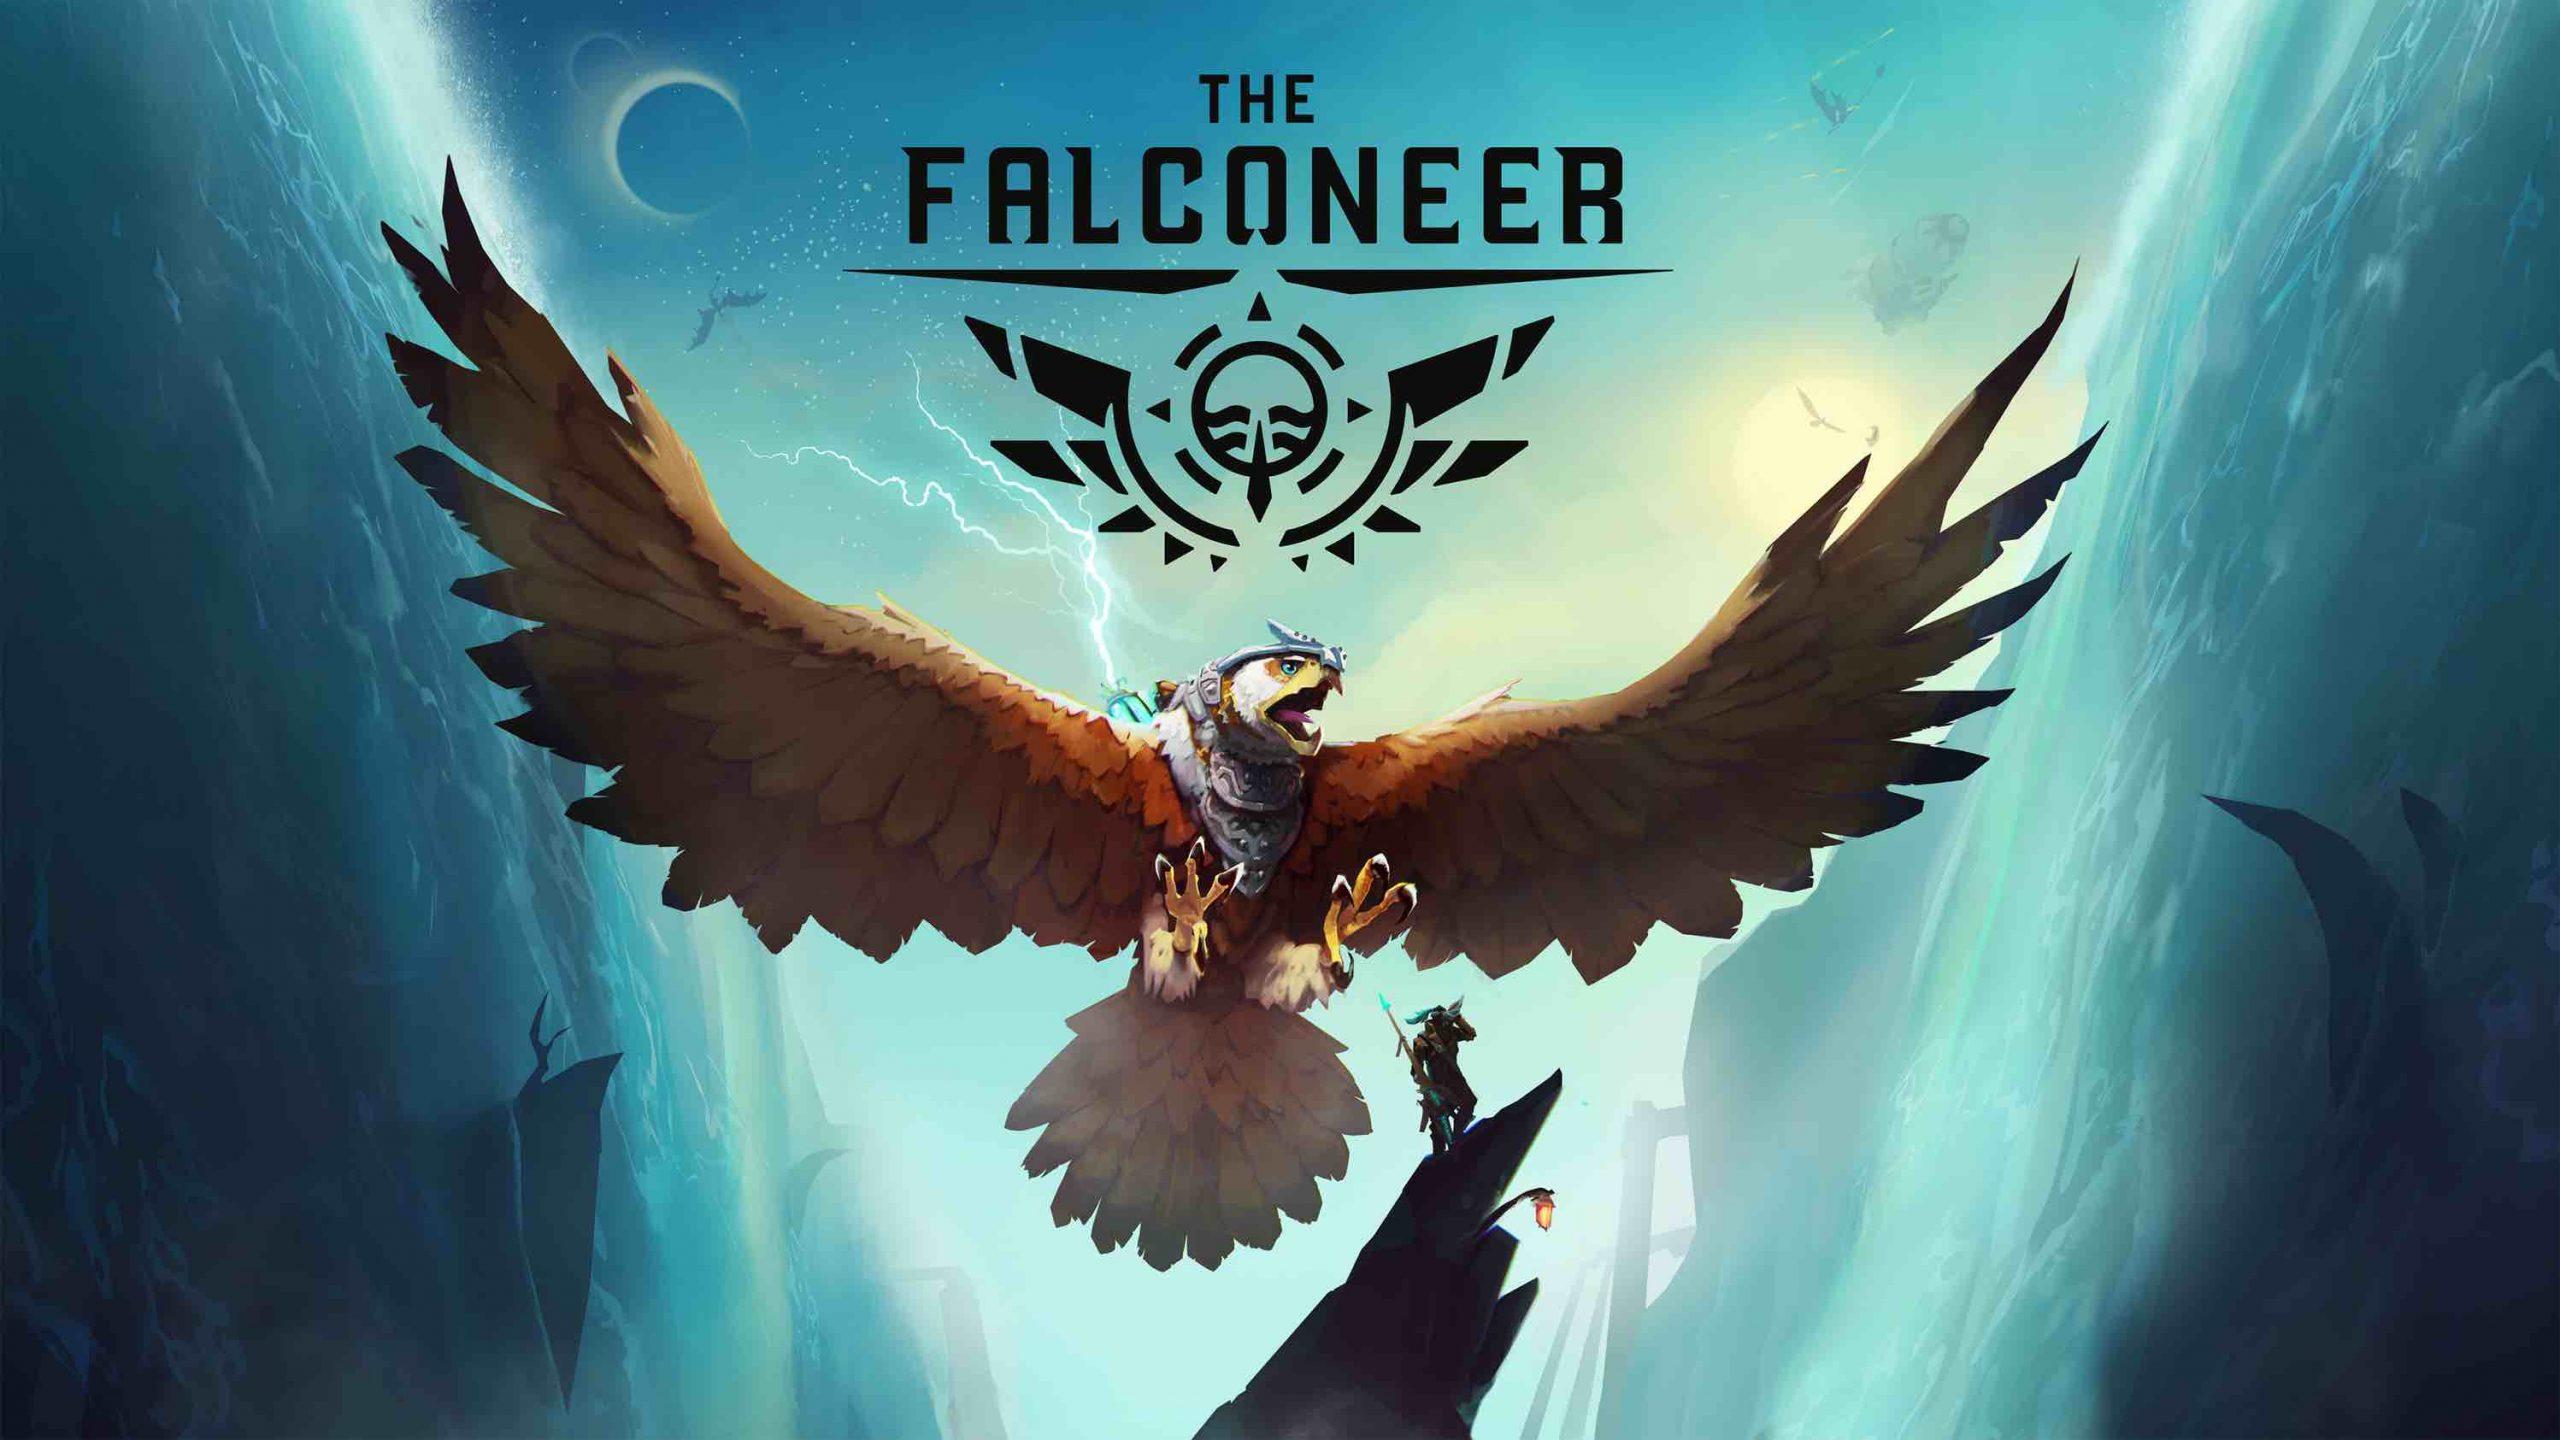 Key Art from The Falconeer